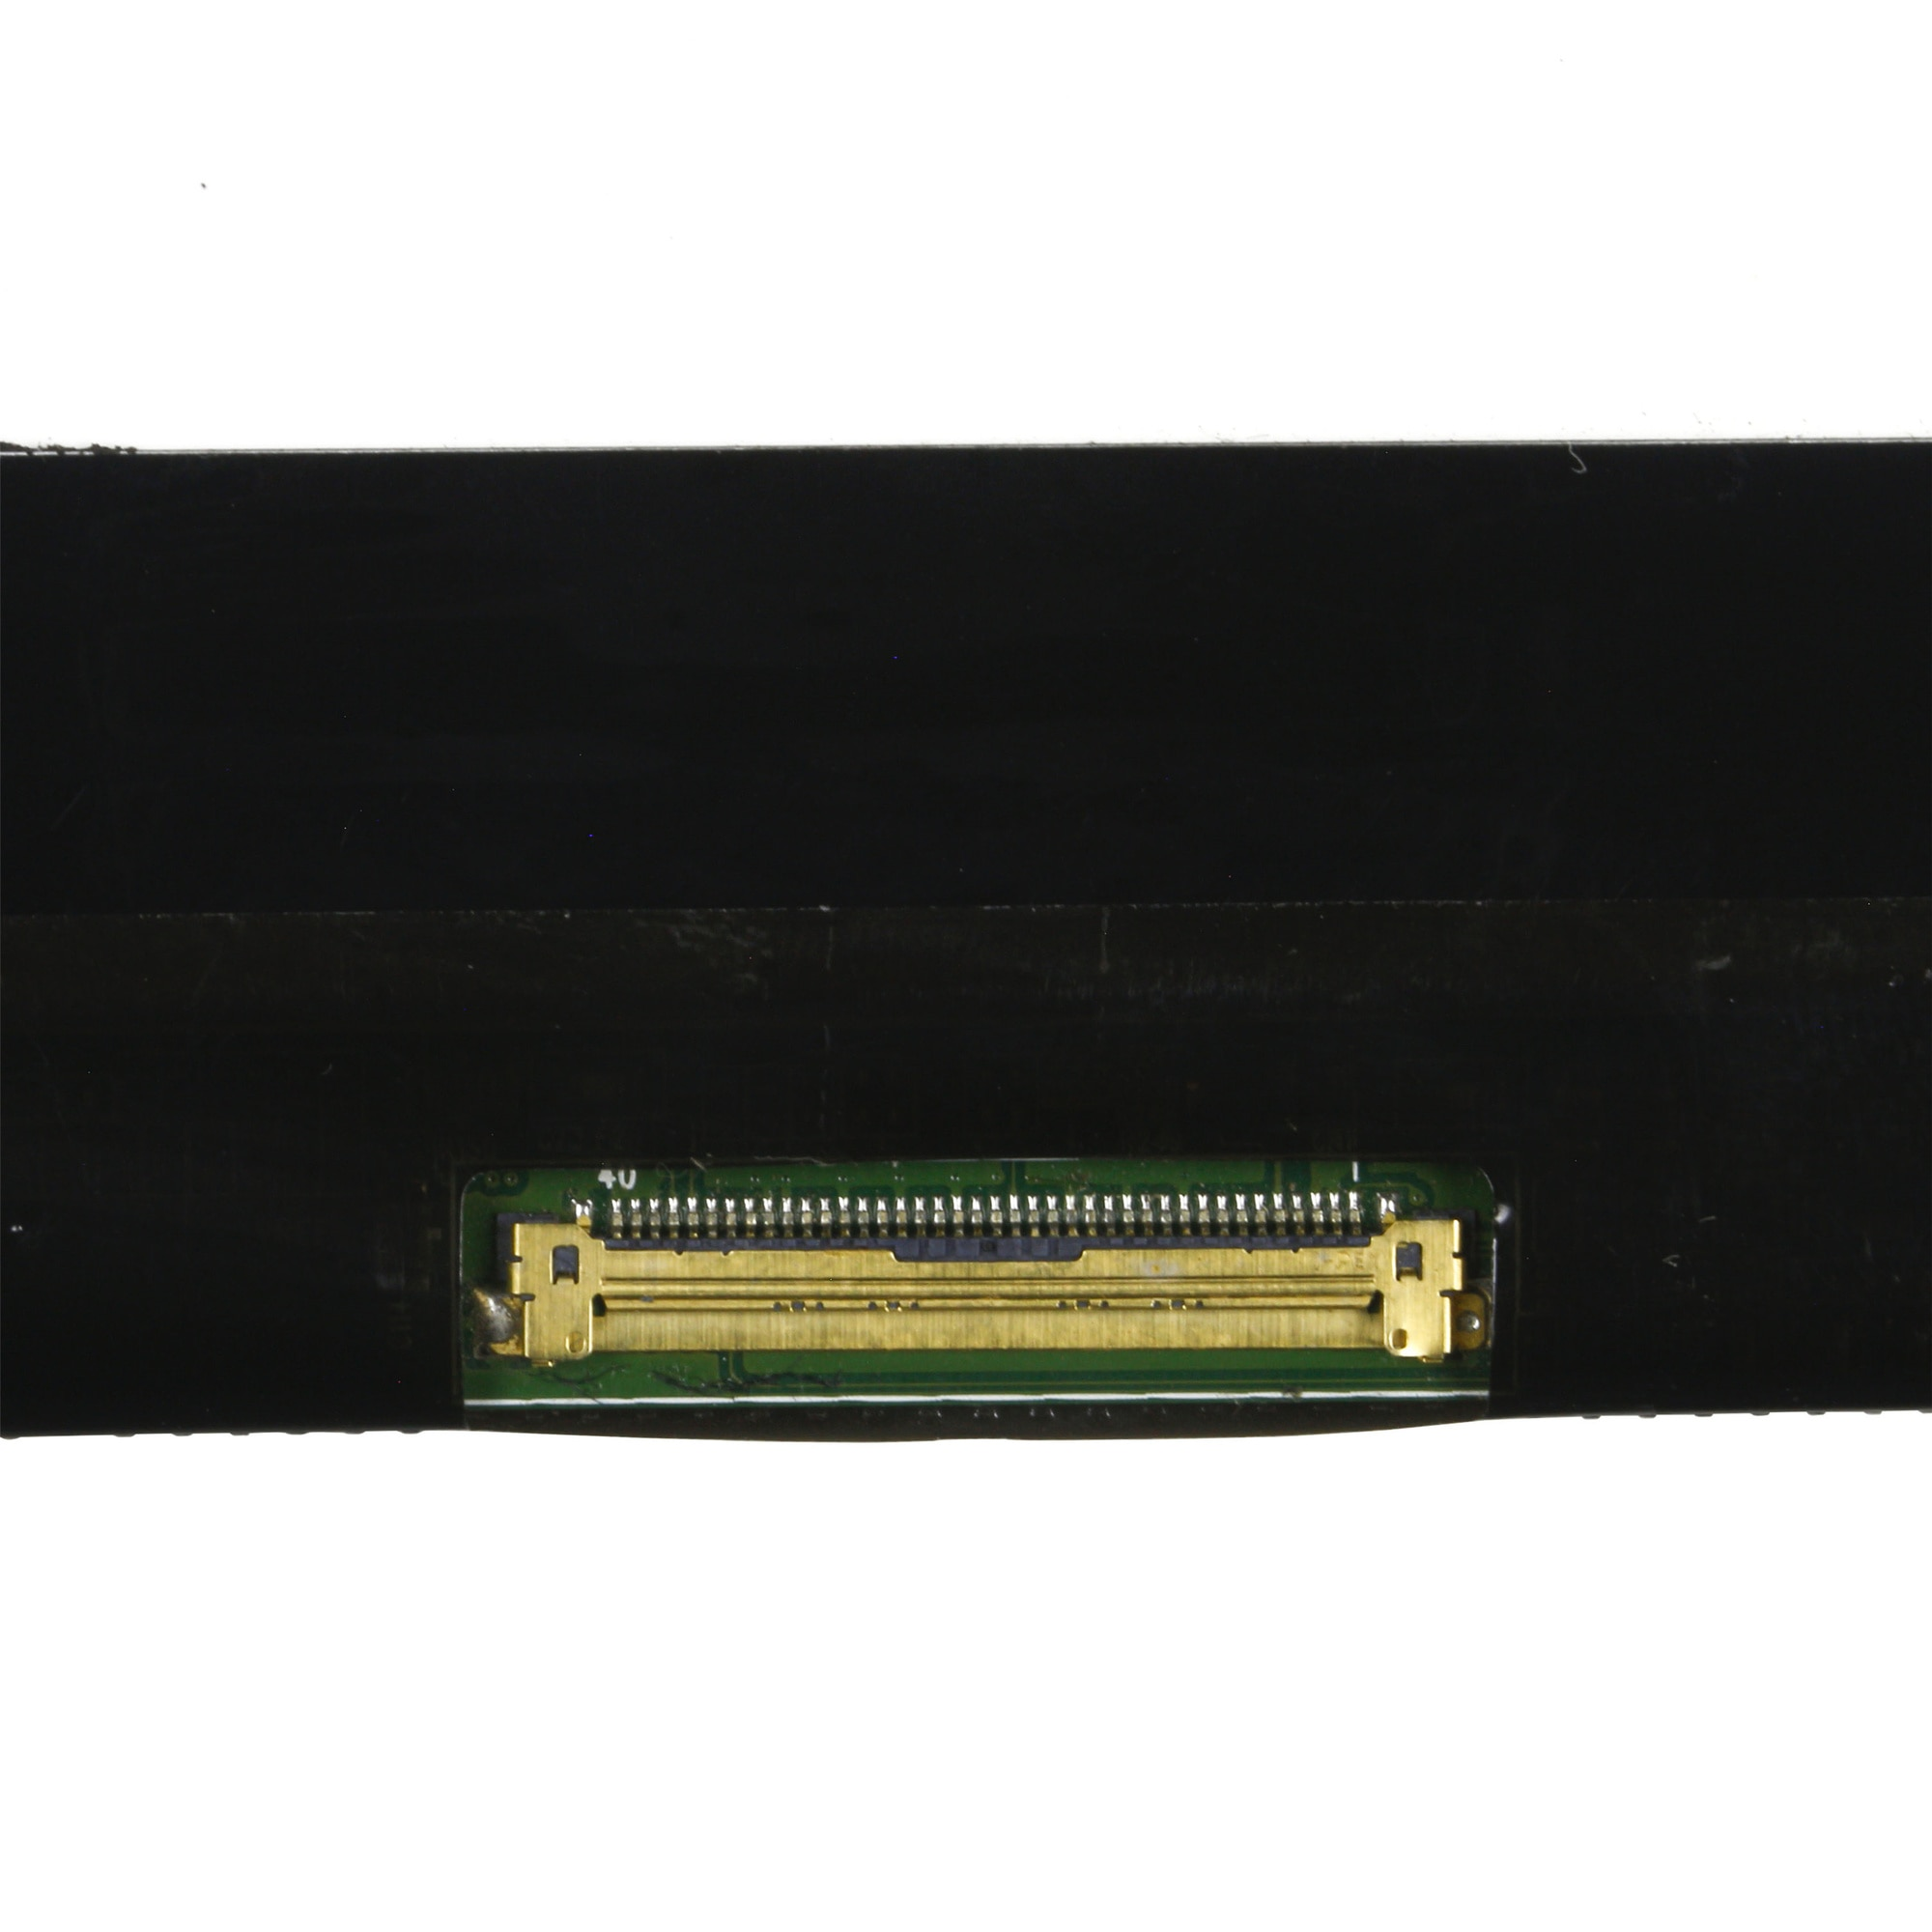 Original laptop LCD, 100% 11.6 inches, HD, 1366x768, b116xw03, v.2, n116bge-l41, Acer   One 725722756 enlarge